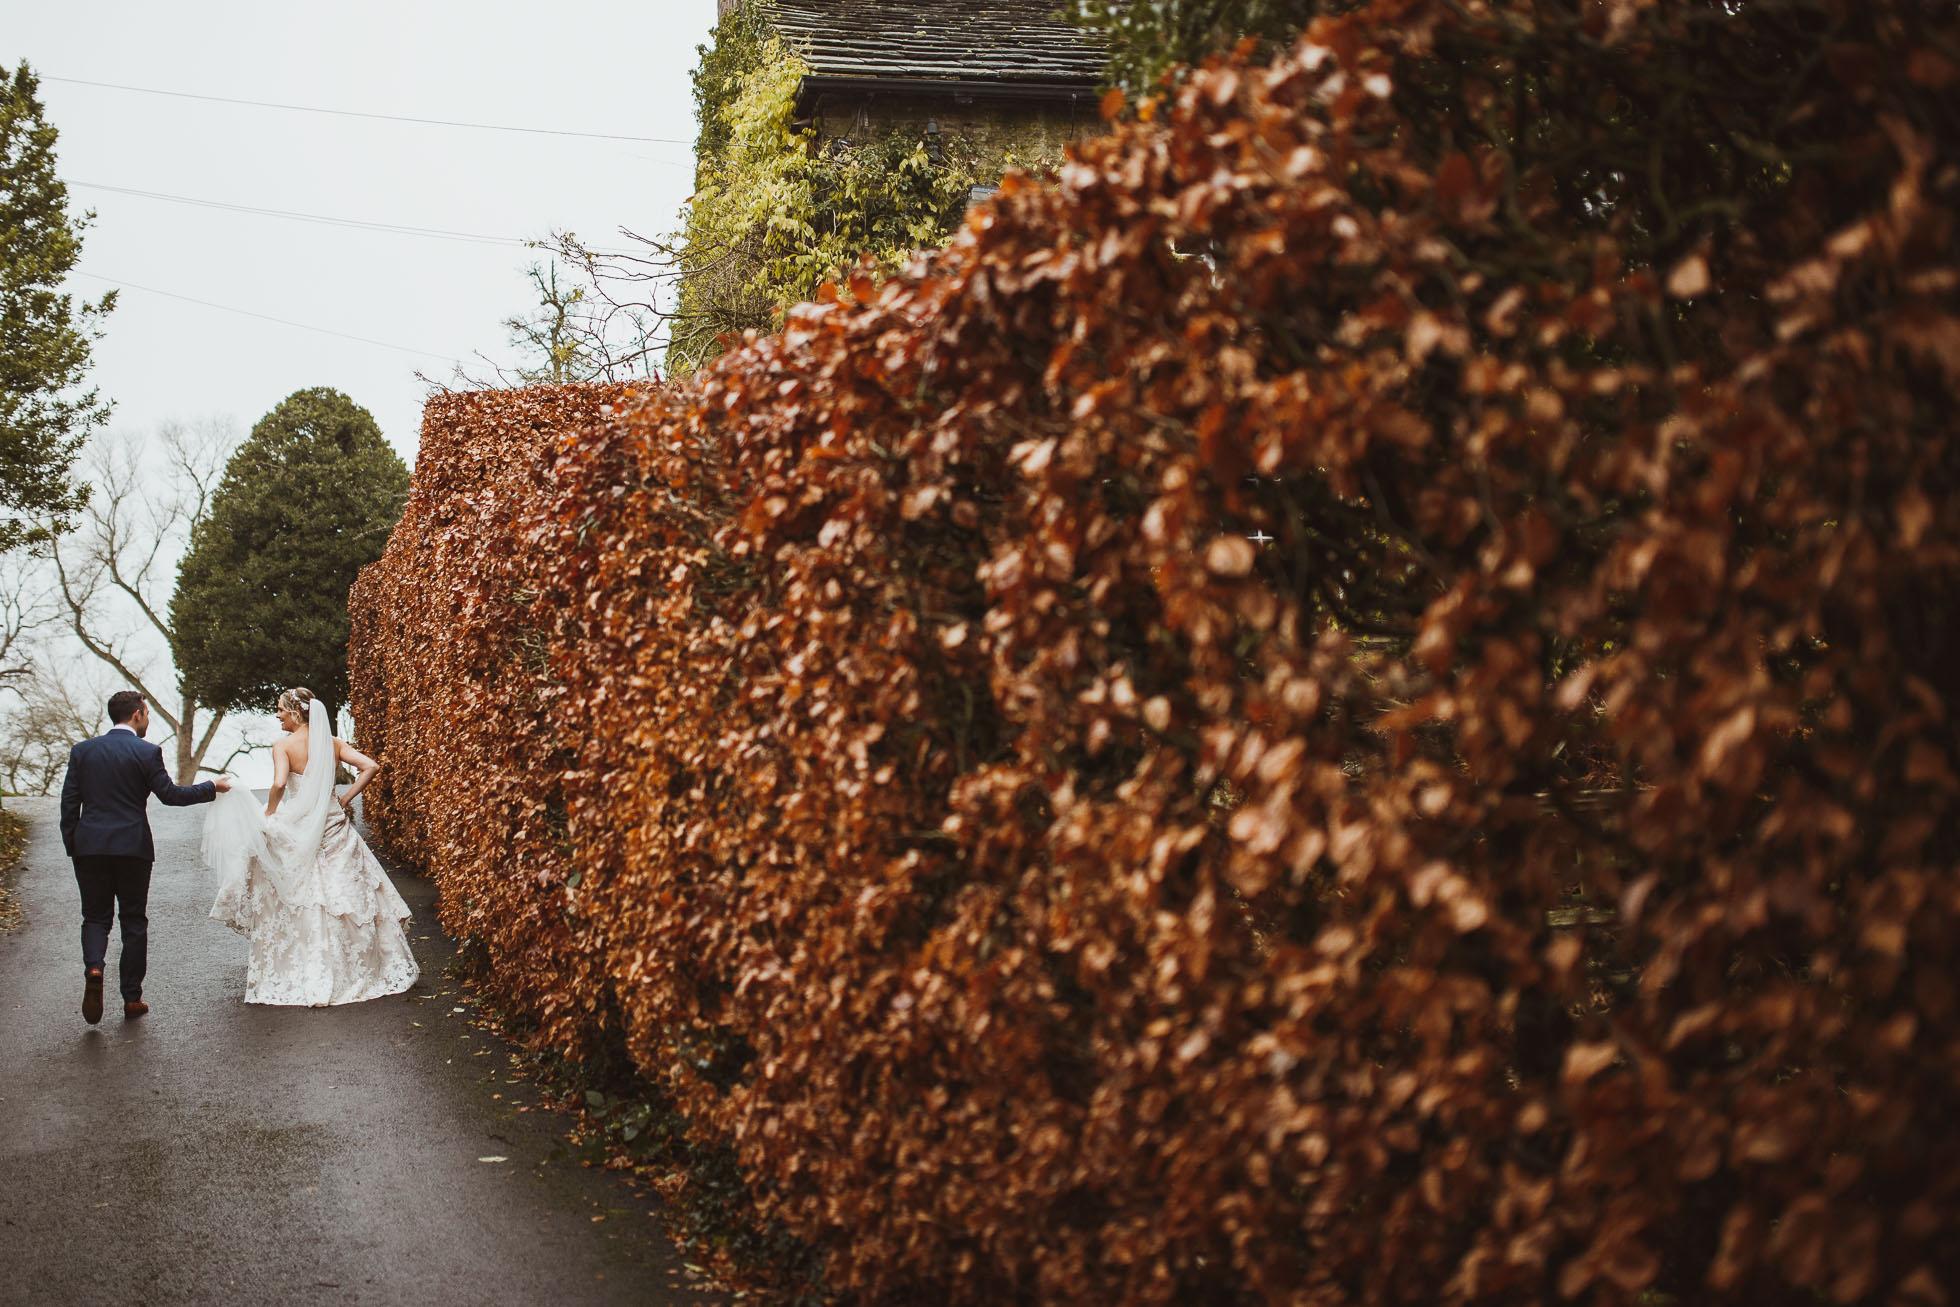 hilltop country house wedding photographer-56.jpg